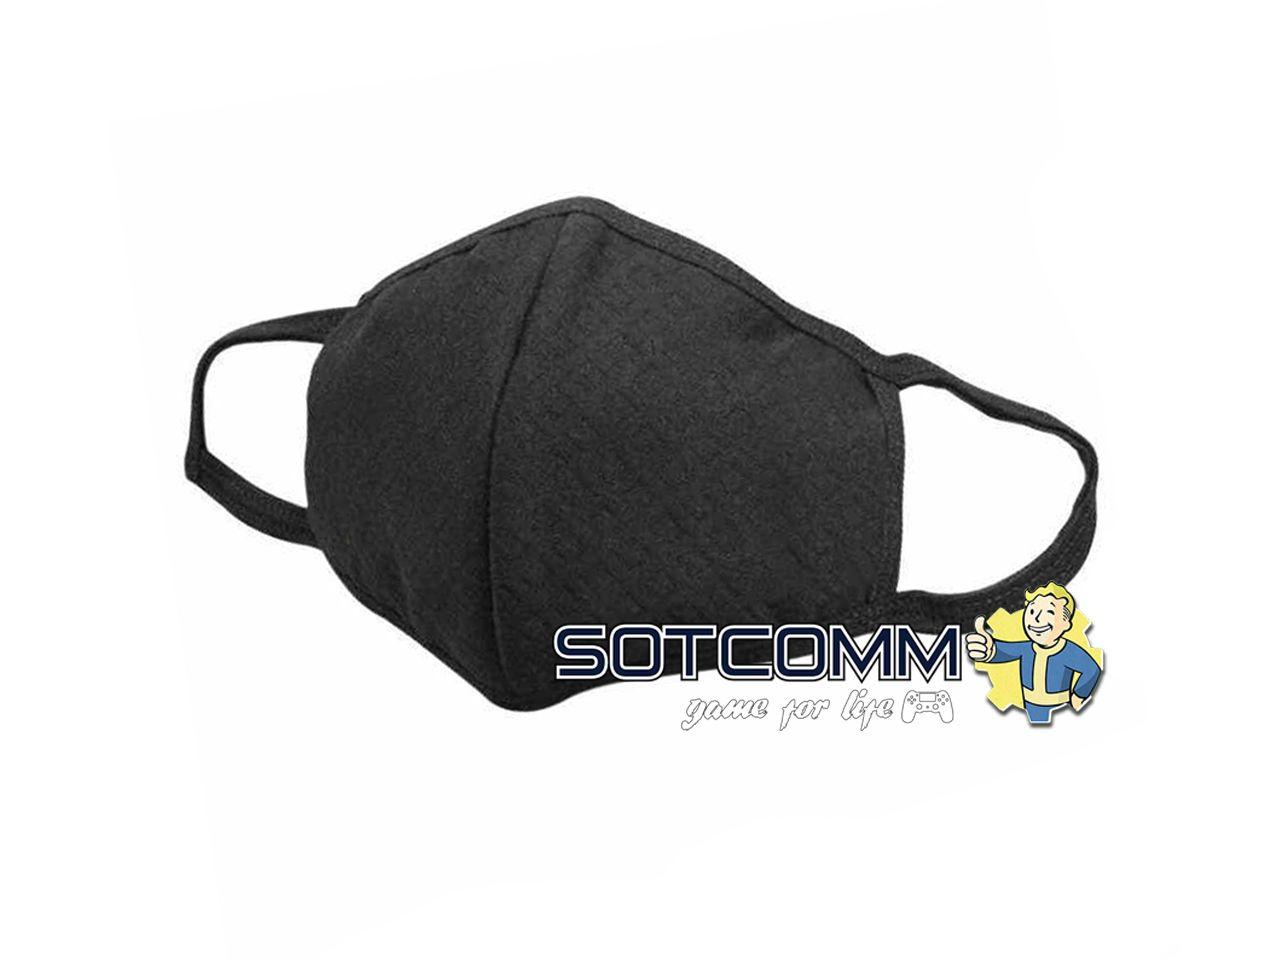 Угольная, защитная маска для лица